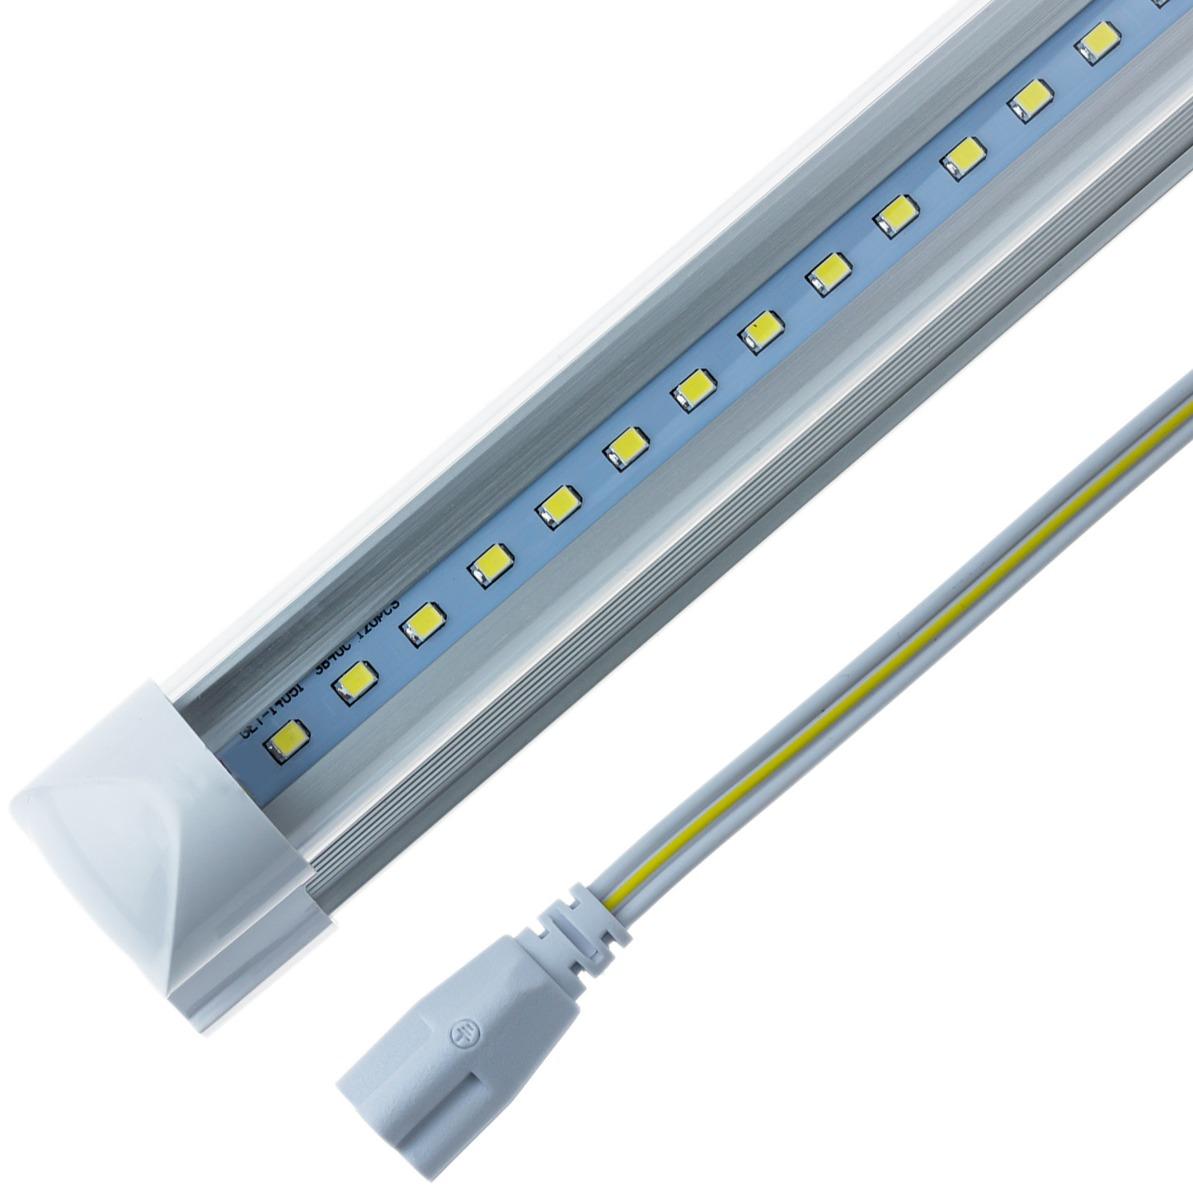 Lampara led t8 18w transparente luz blanca base jwj b42618 en mercado libre - Lamparas led para interiores ...